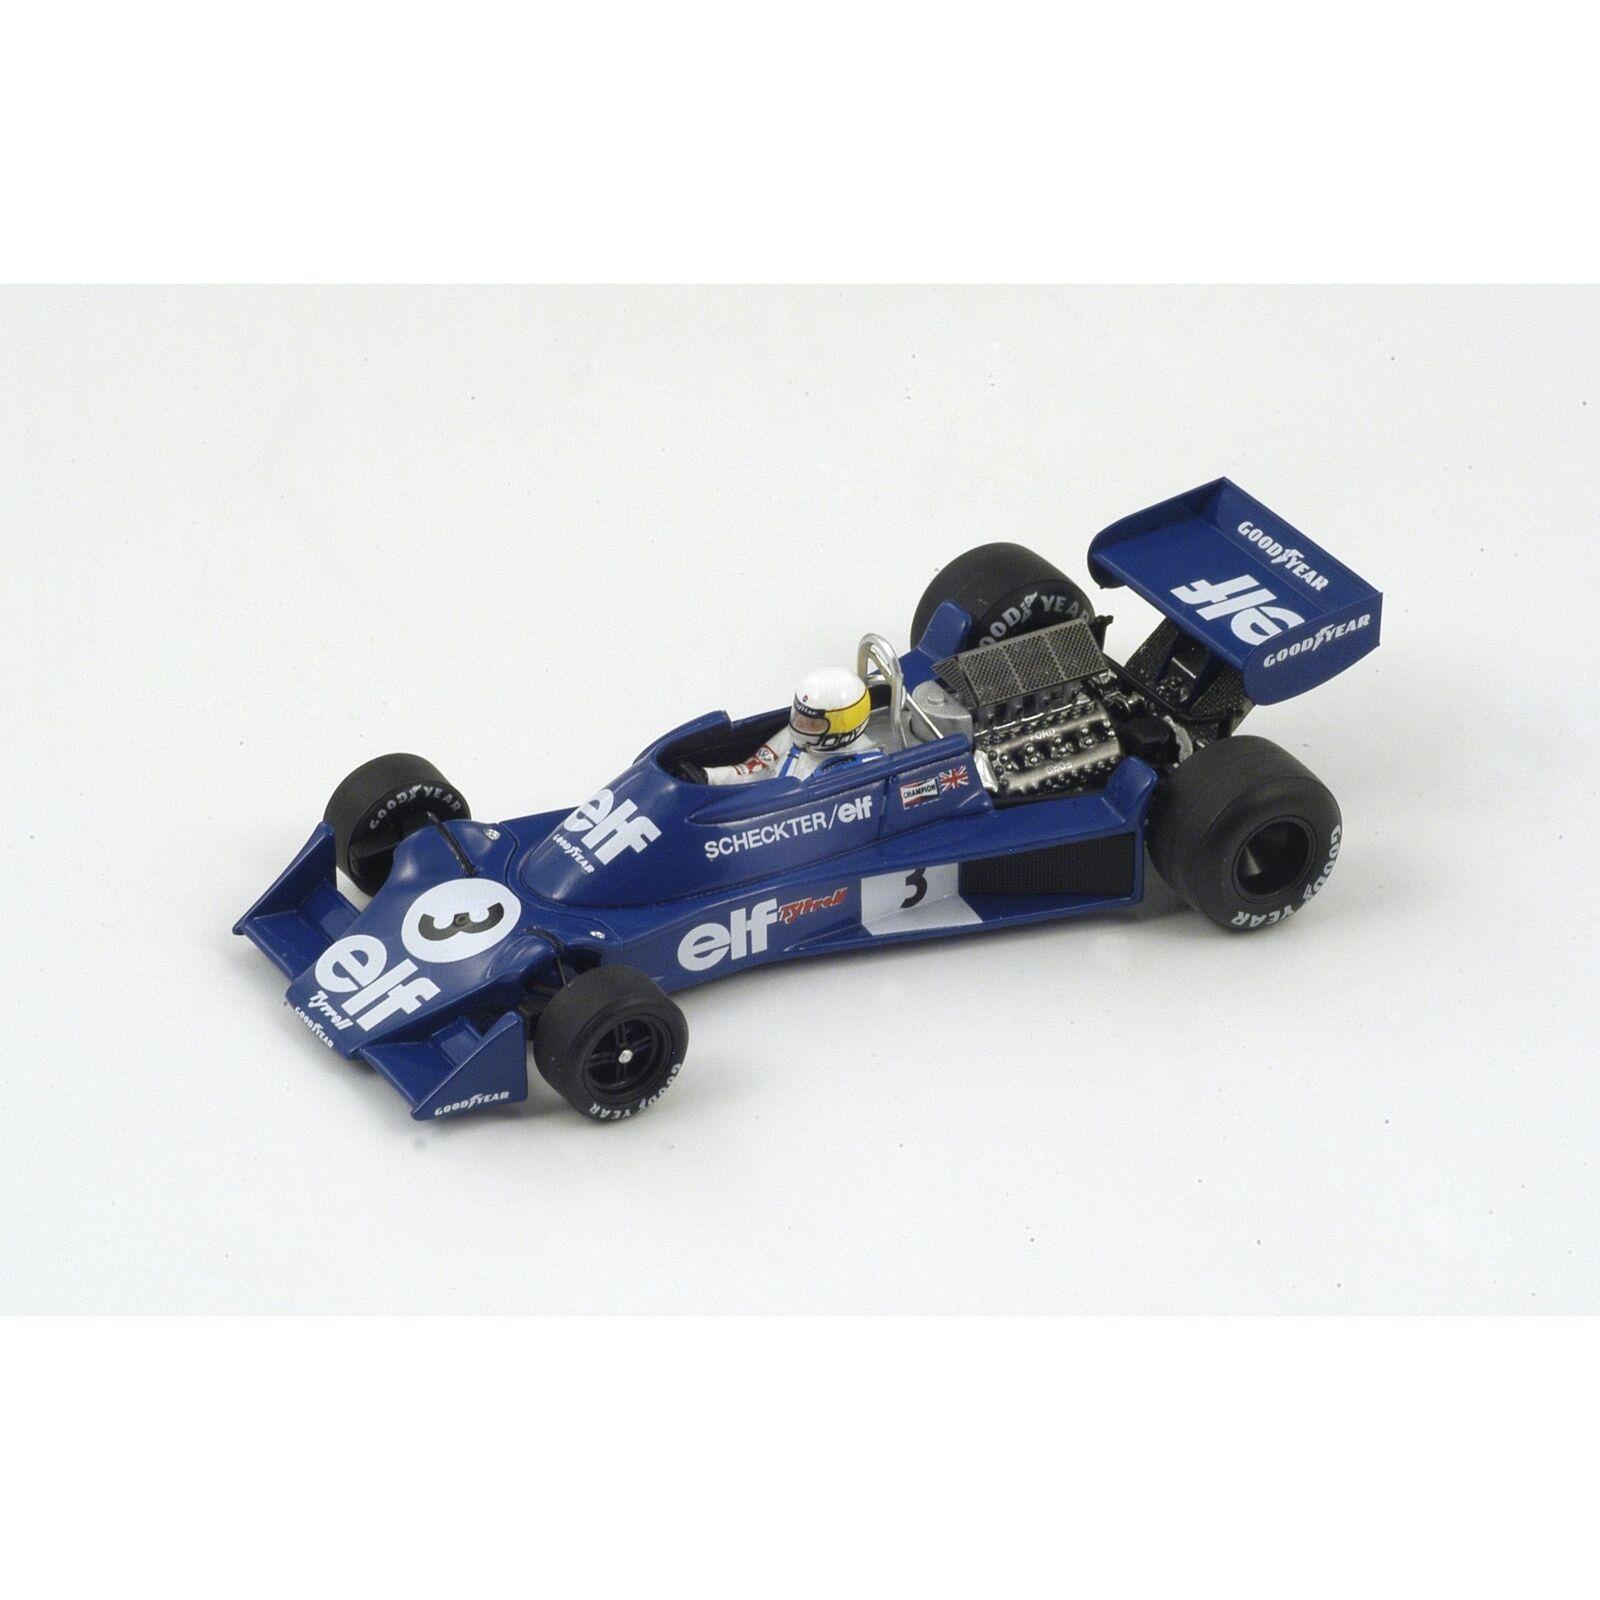 Spark tyrrell 007 no.3 gp spain 1976 jody ferrari s1882  1 43  excellent prix